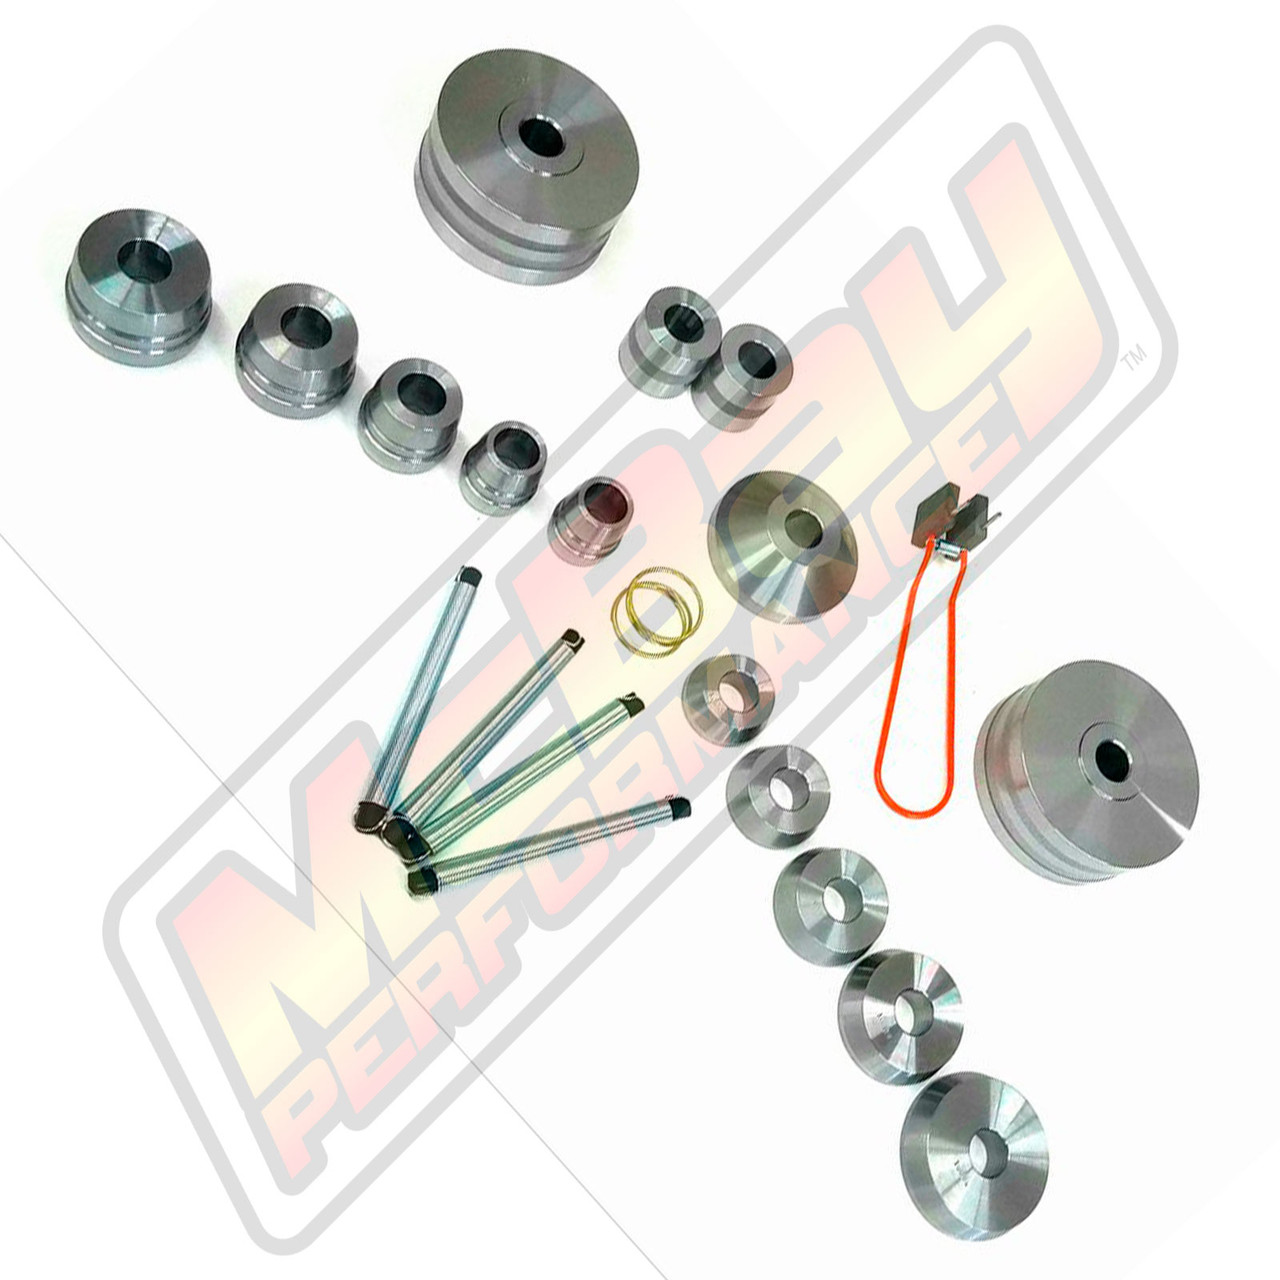 "10007 - 18 Piece Gold Brake Lathe Cone & Adapter Set - 1"" Arbor | McBay Performance"